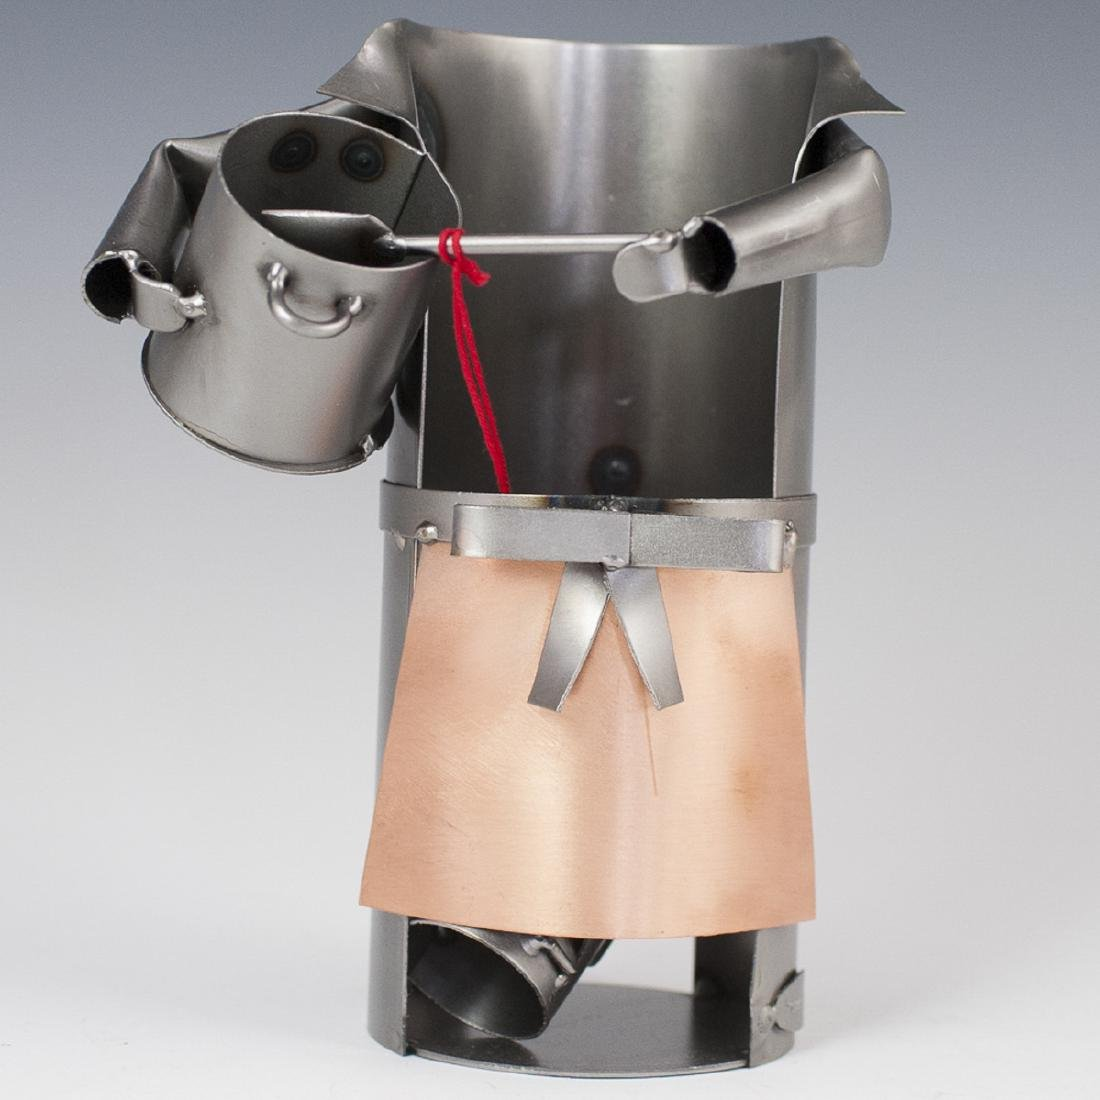 Italian Recycled Metal Steampunk Wine Bottle Holder